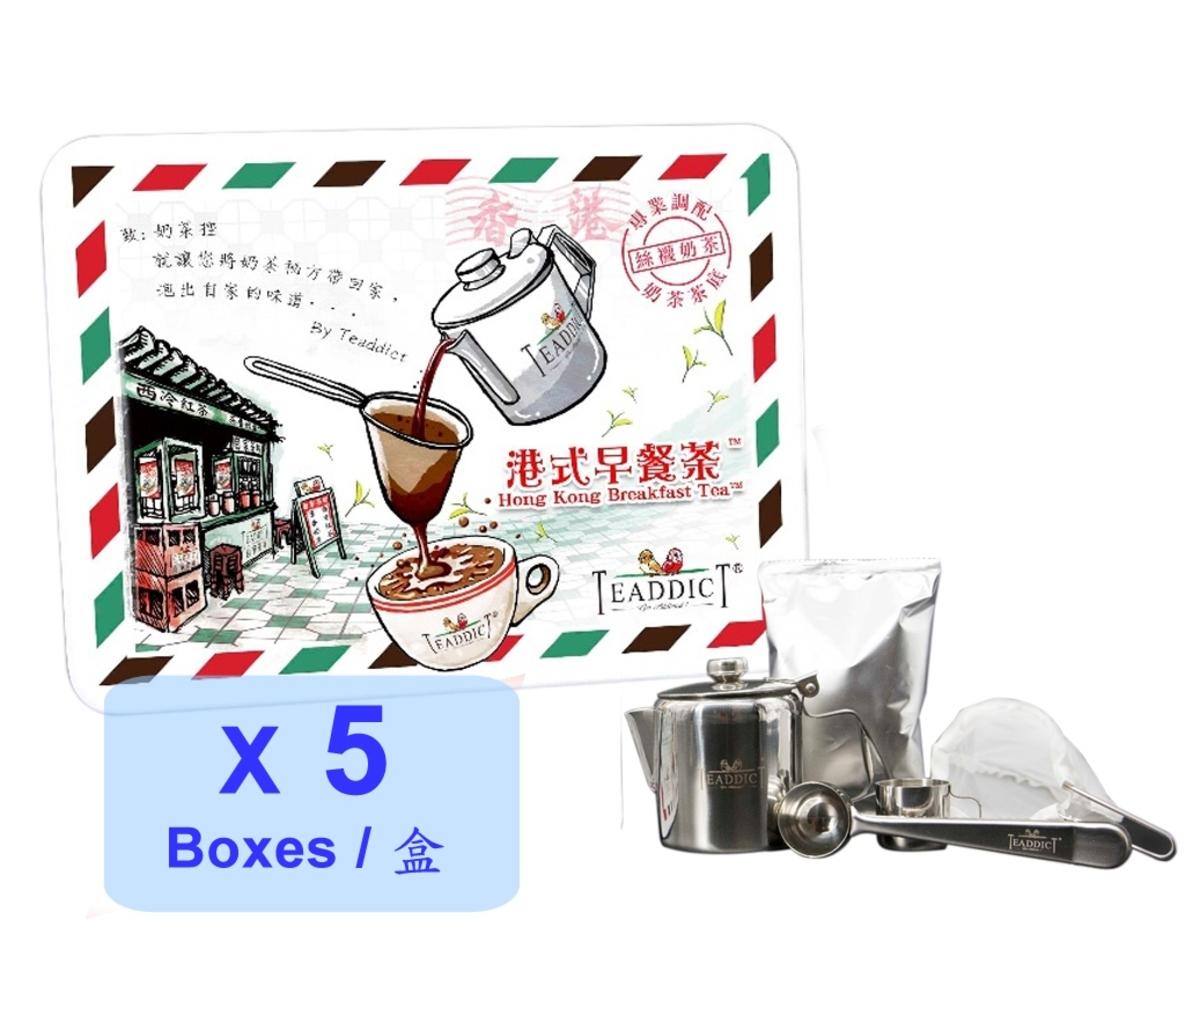 Hong Kong Breakfast Tea (Milk Tea) Parcel Edition DIY Kit Set (5 set)